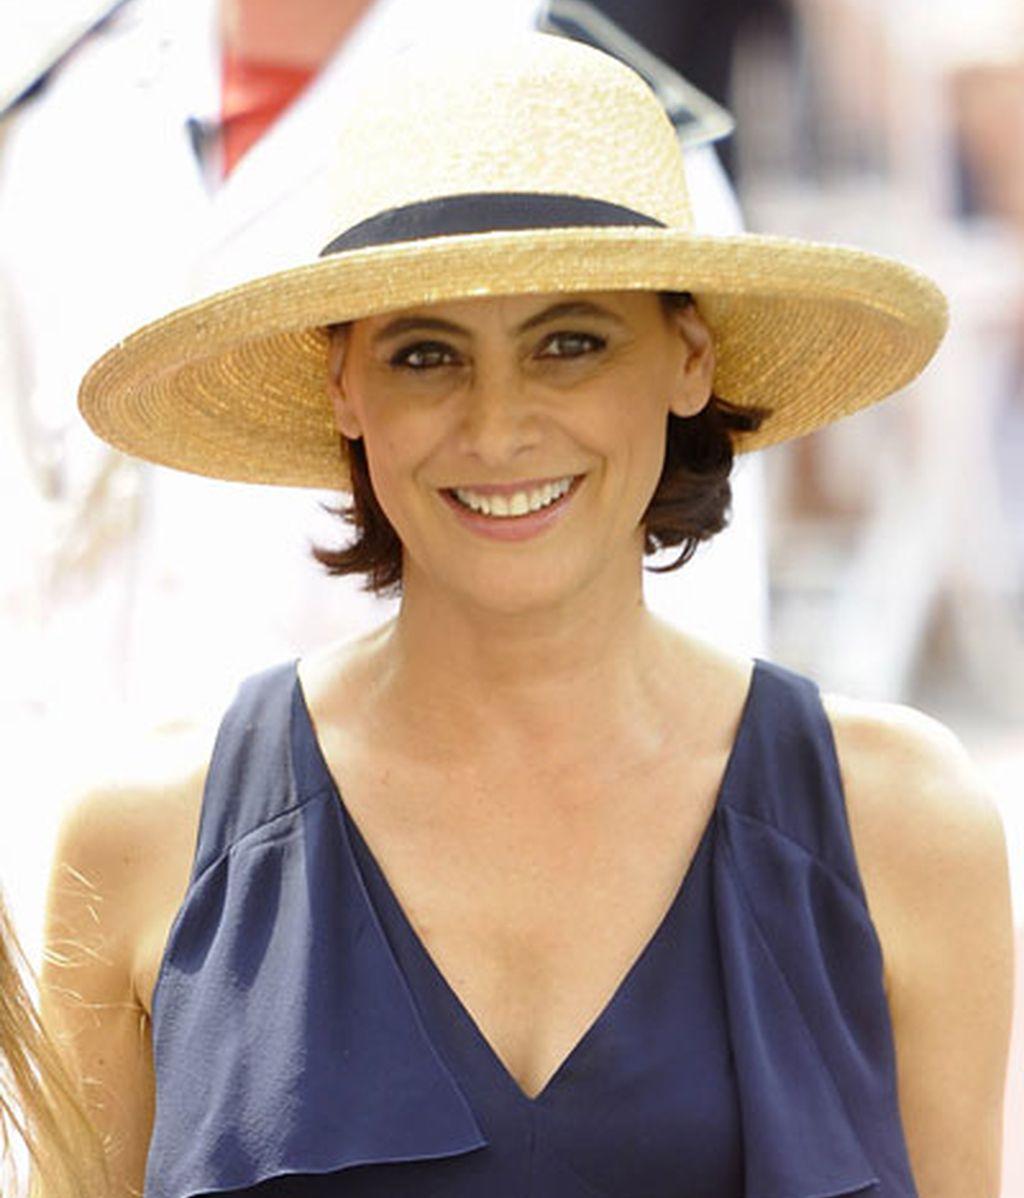 Inés de la Fressange, con sombrero de paja